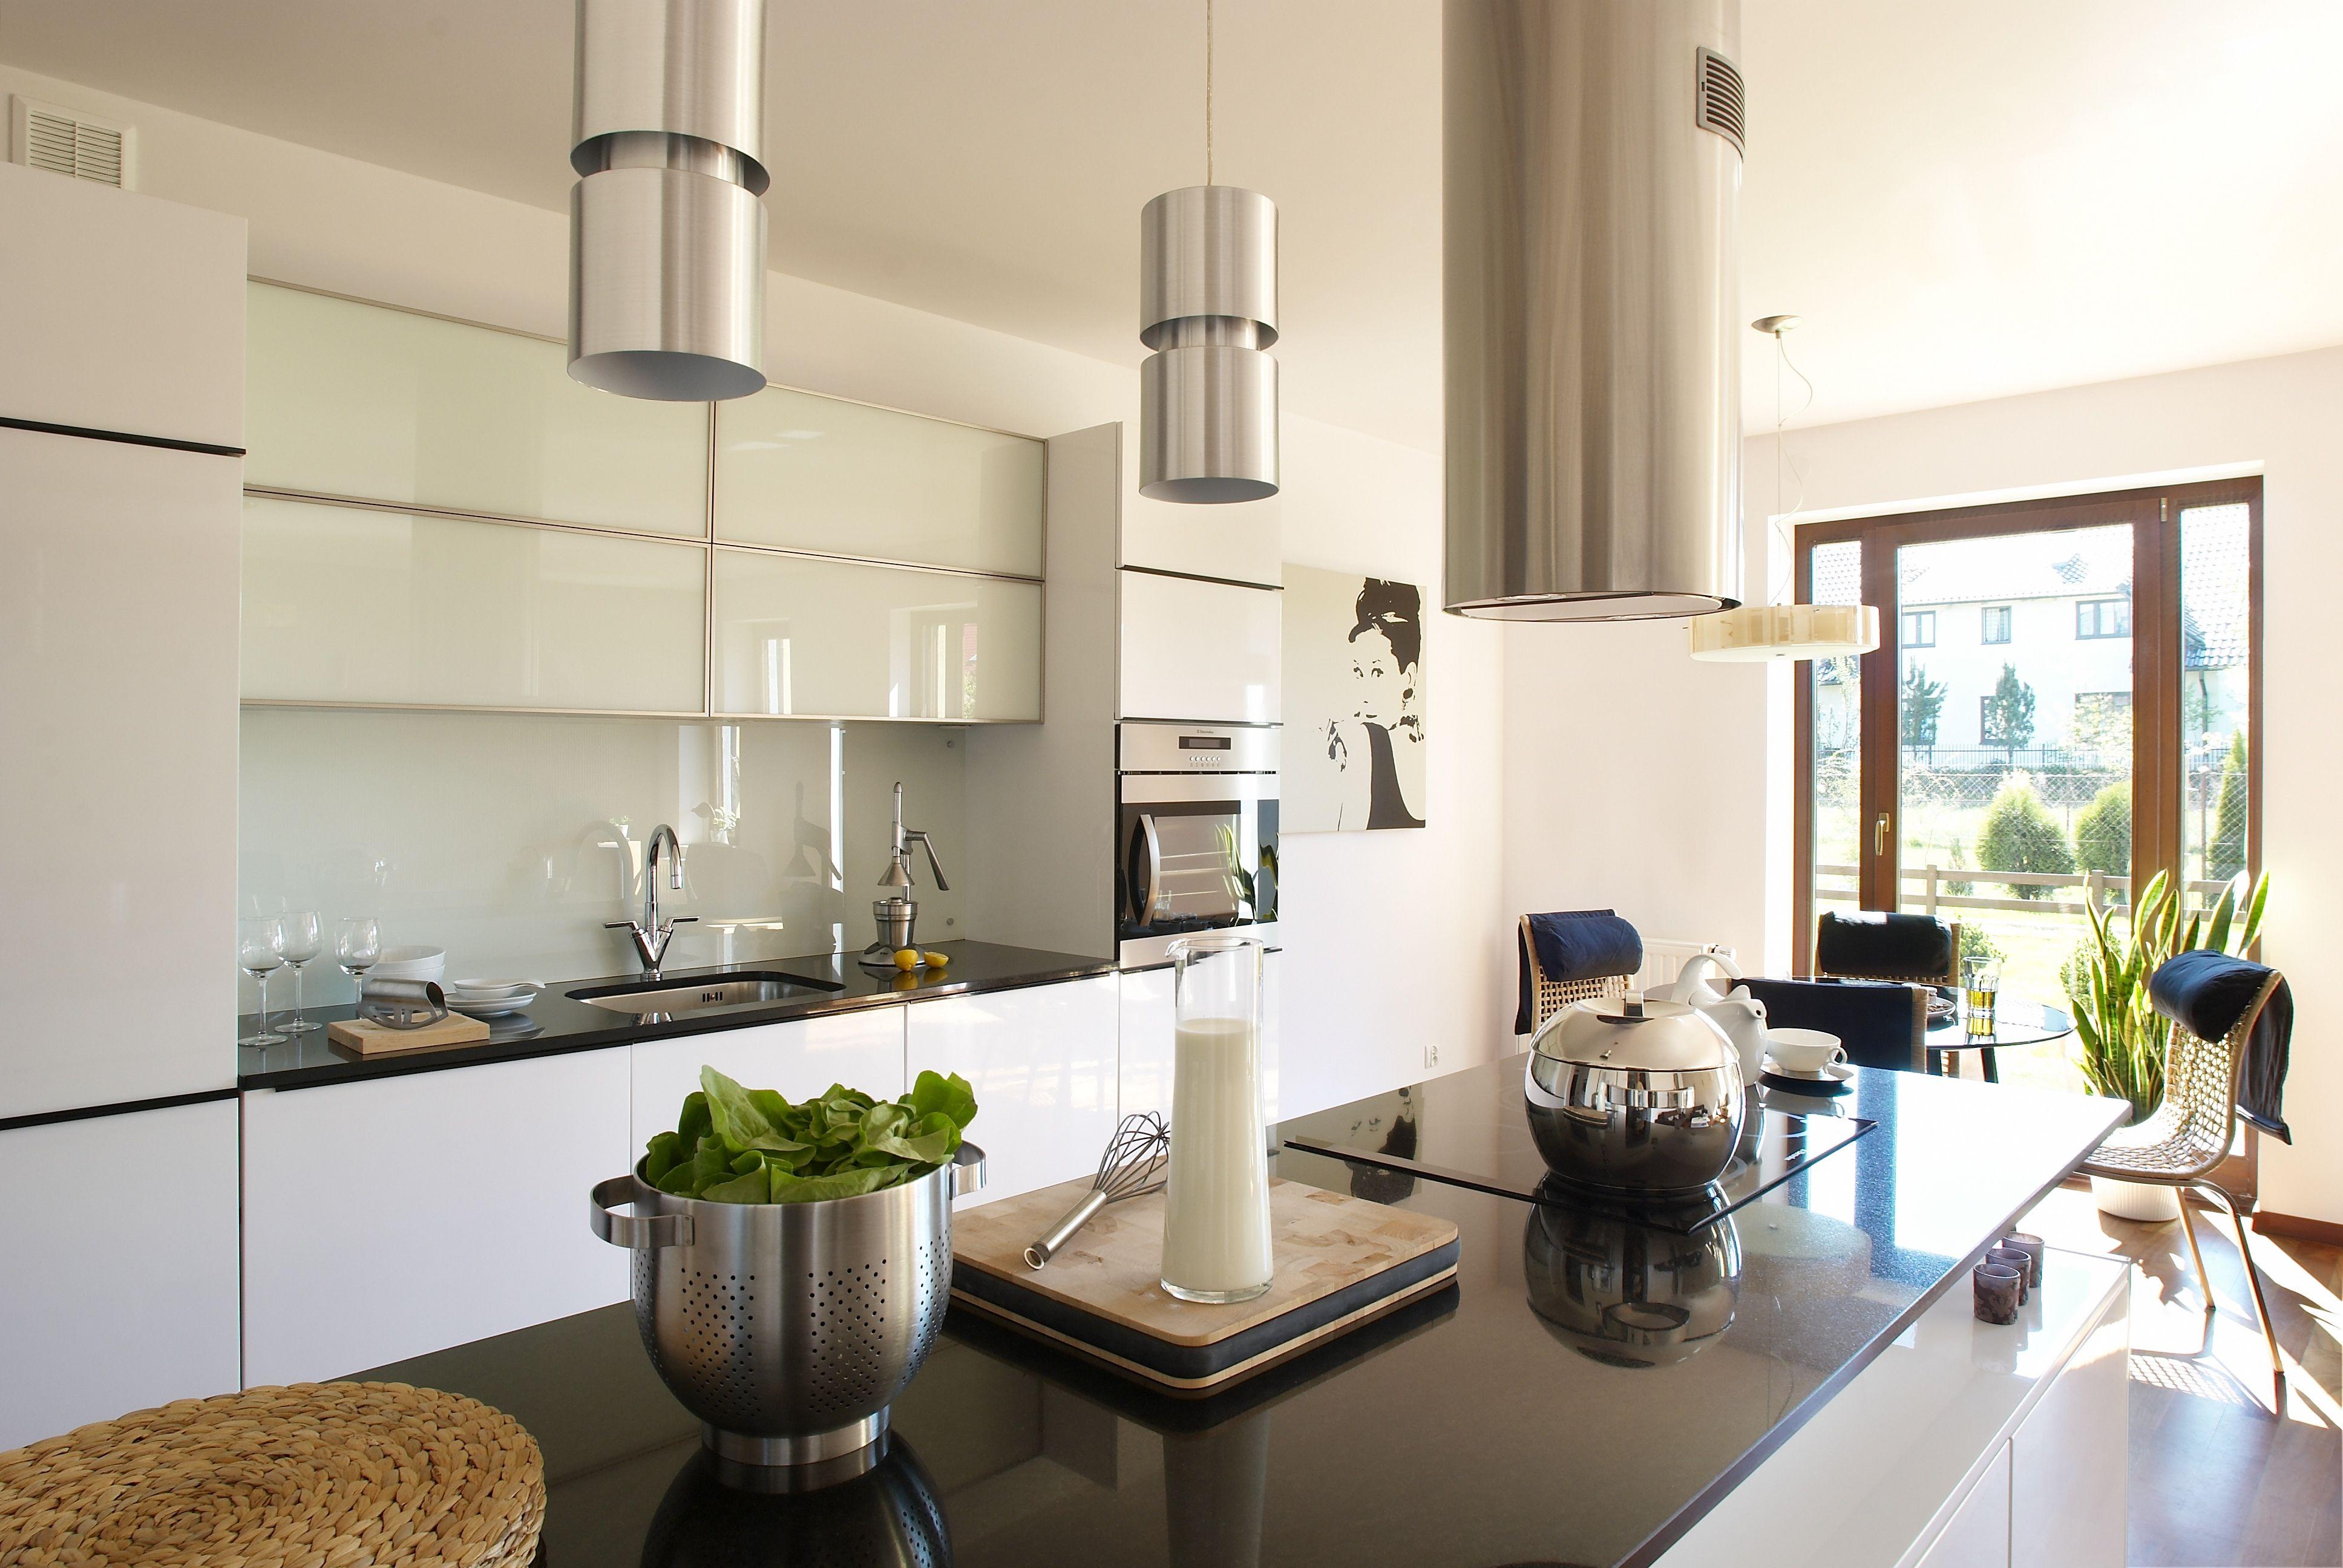 Szklo Na Scianie W Kuchni Galeria Pomyslow Co Na Sciane W Kuchni Zamiast Plytek Kitchen Dining Room Modern Kitchen Kitchen